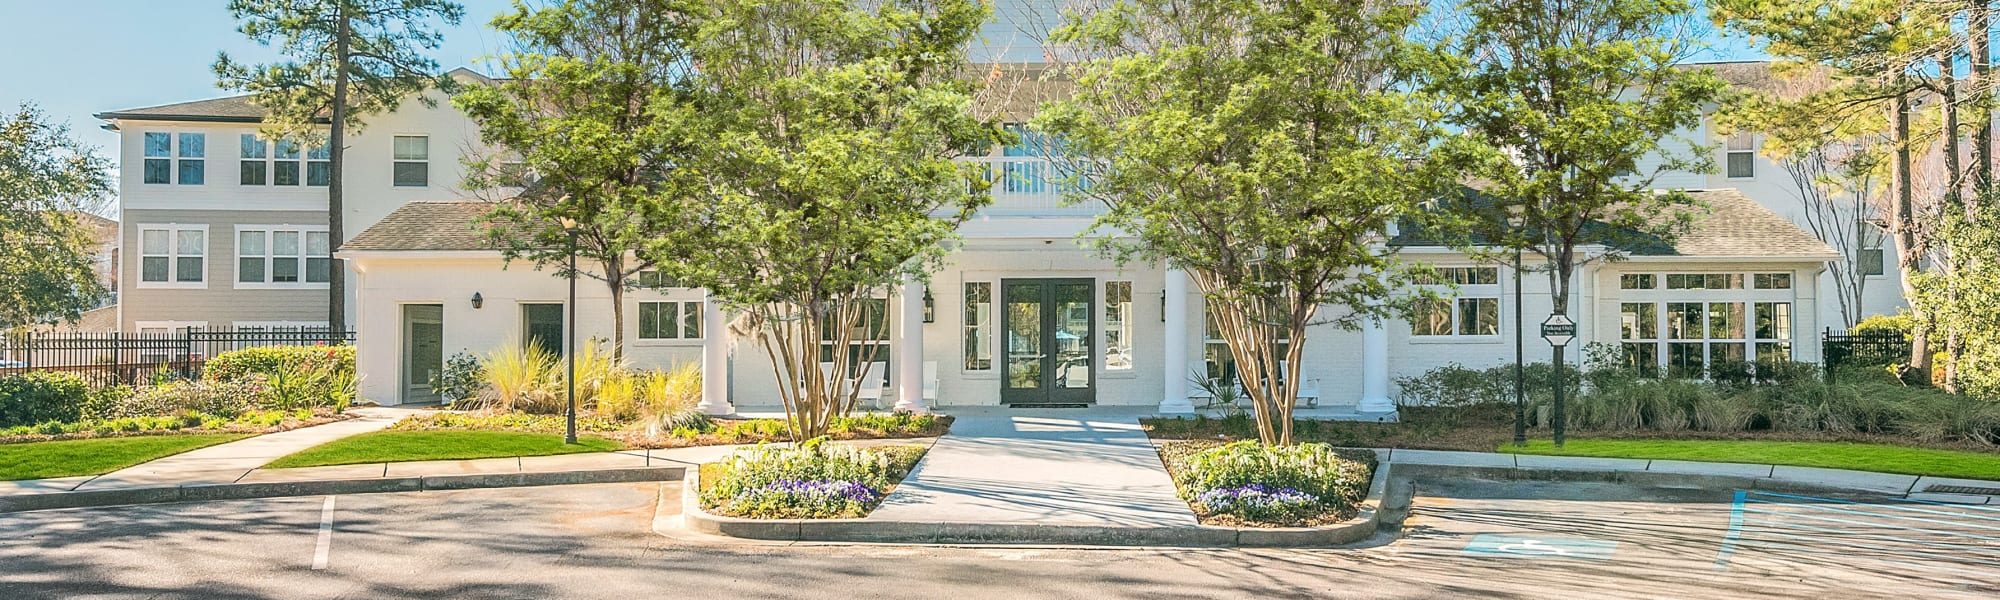 Neighborhood near Ingleside Apartments in North Charleston, South Carolina